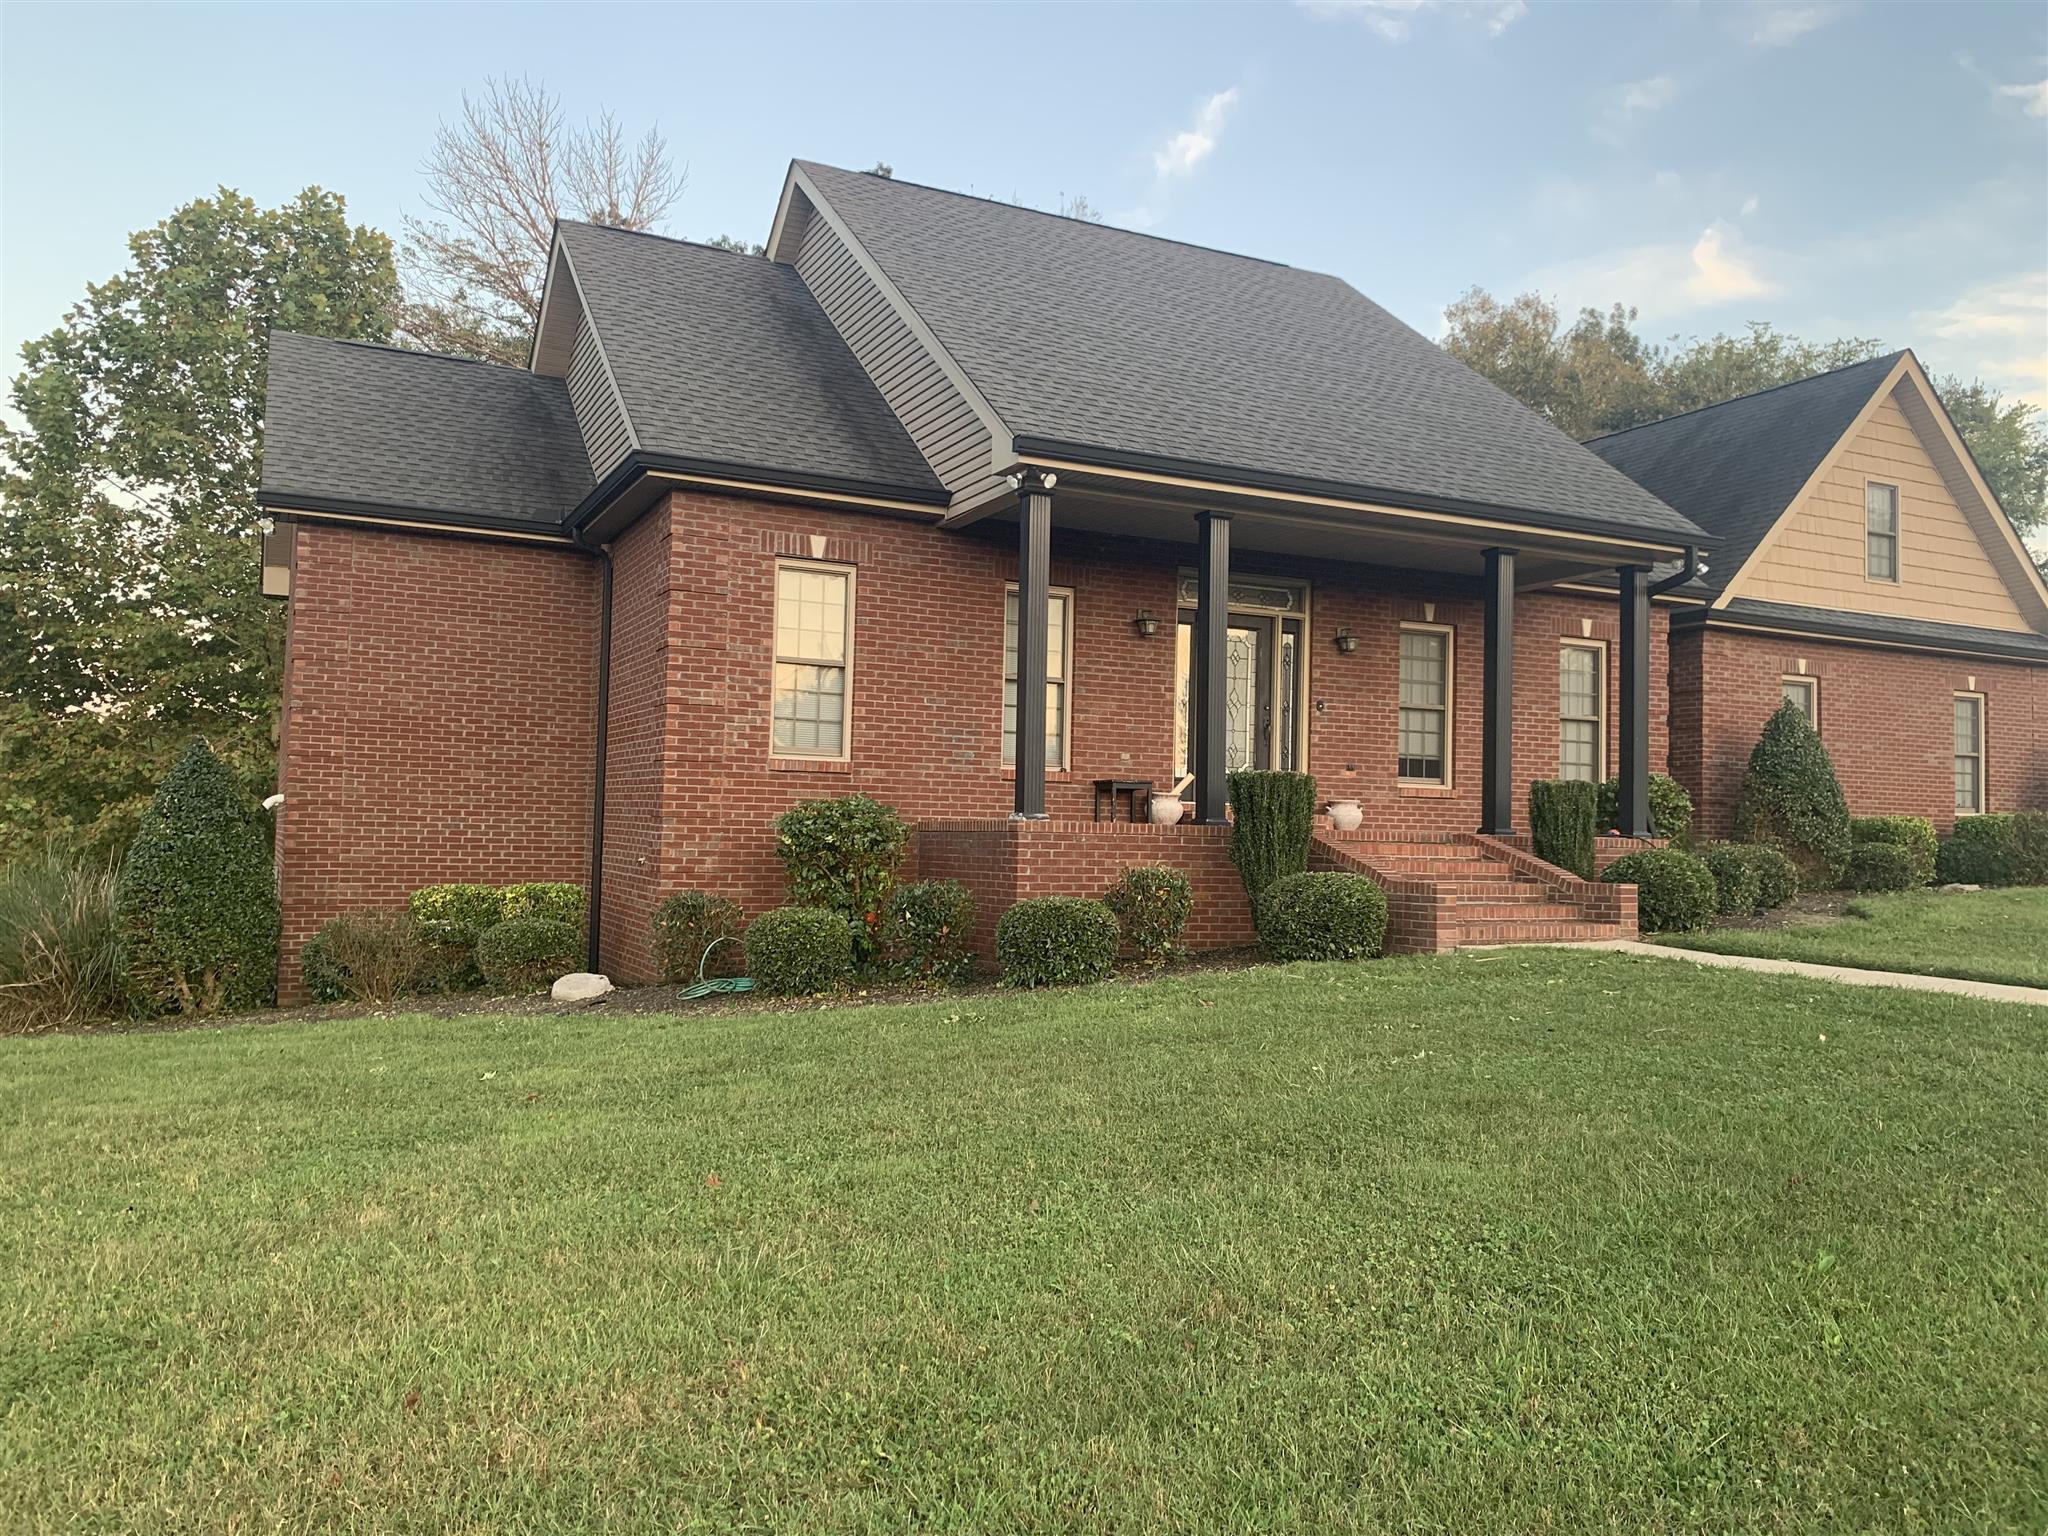 111 Poplar Dr, Brush Creek, TN 38547 - Brush Creek, TN real estate listing